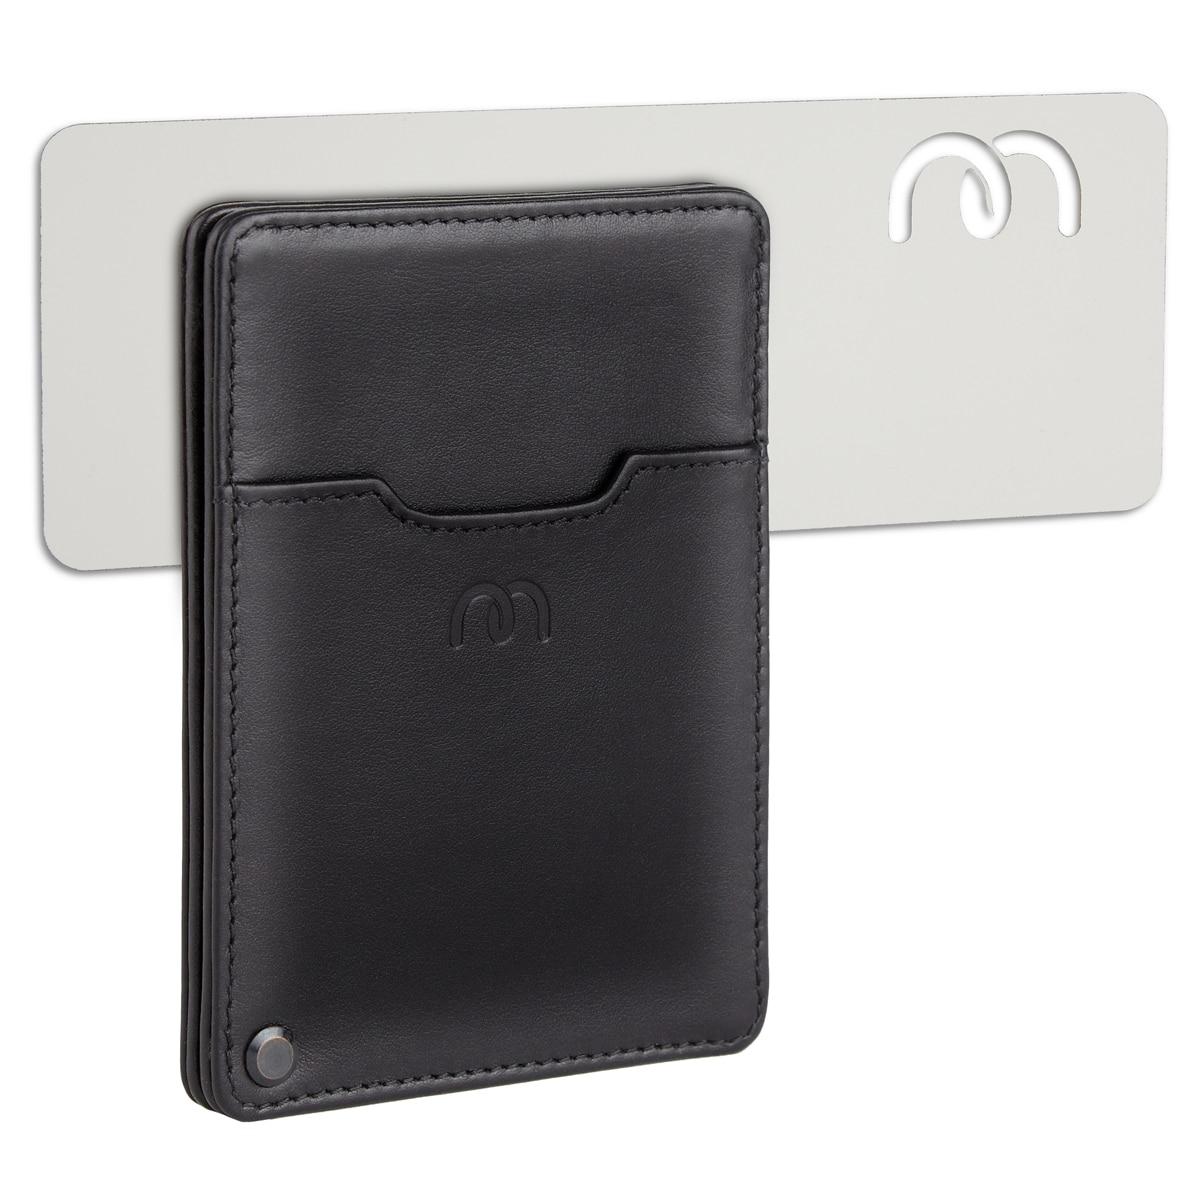 design unic vânzare uriașă transport gratuit Portofel inteligent din piele naturala, Magnetto Smart, slim, protectie  RFID, suport inclus, negru - eMAG.ro